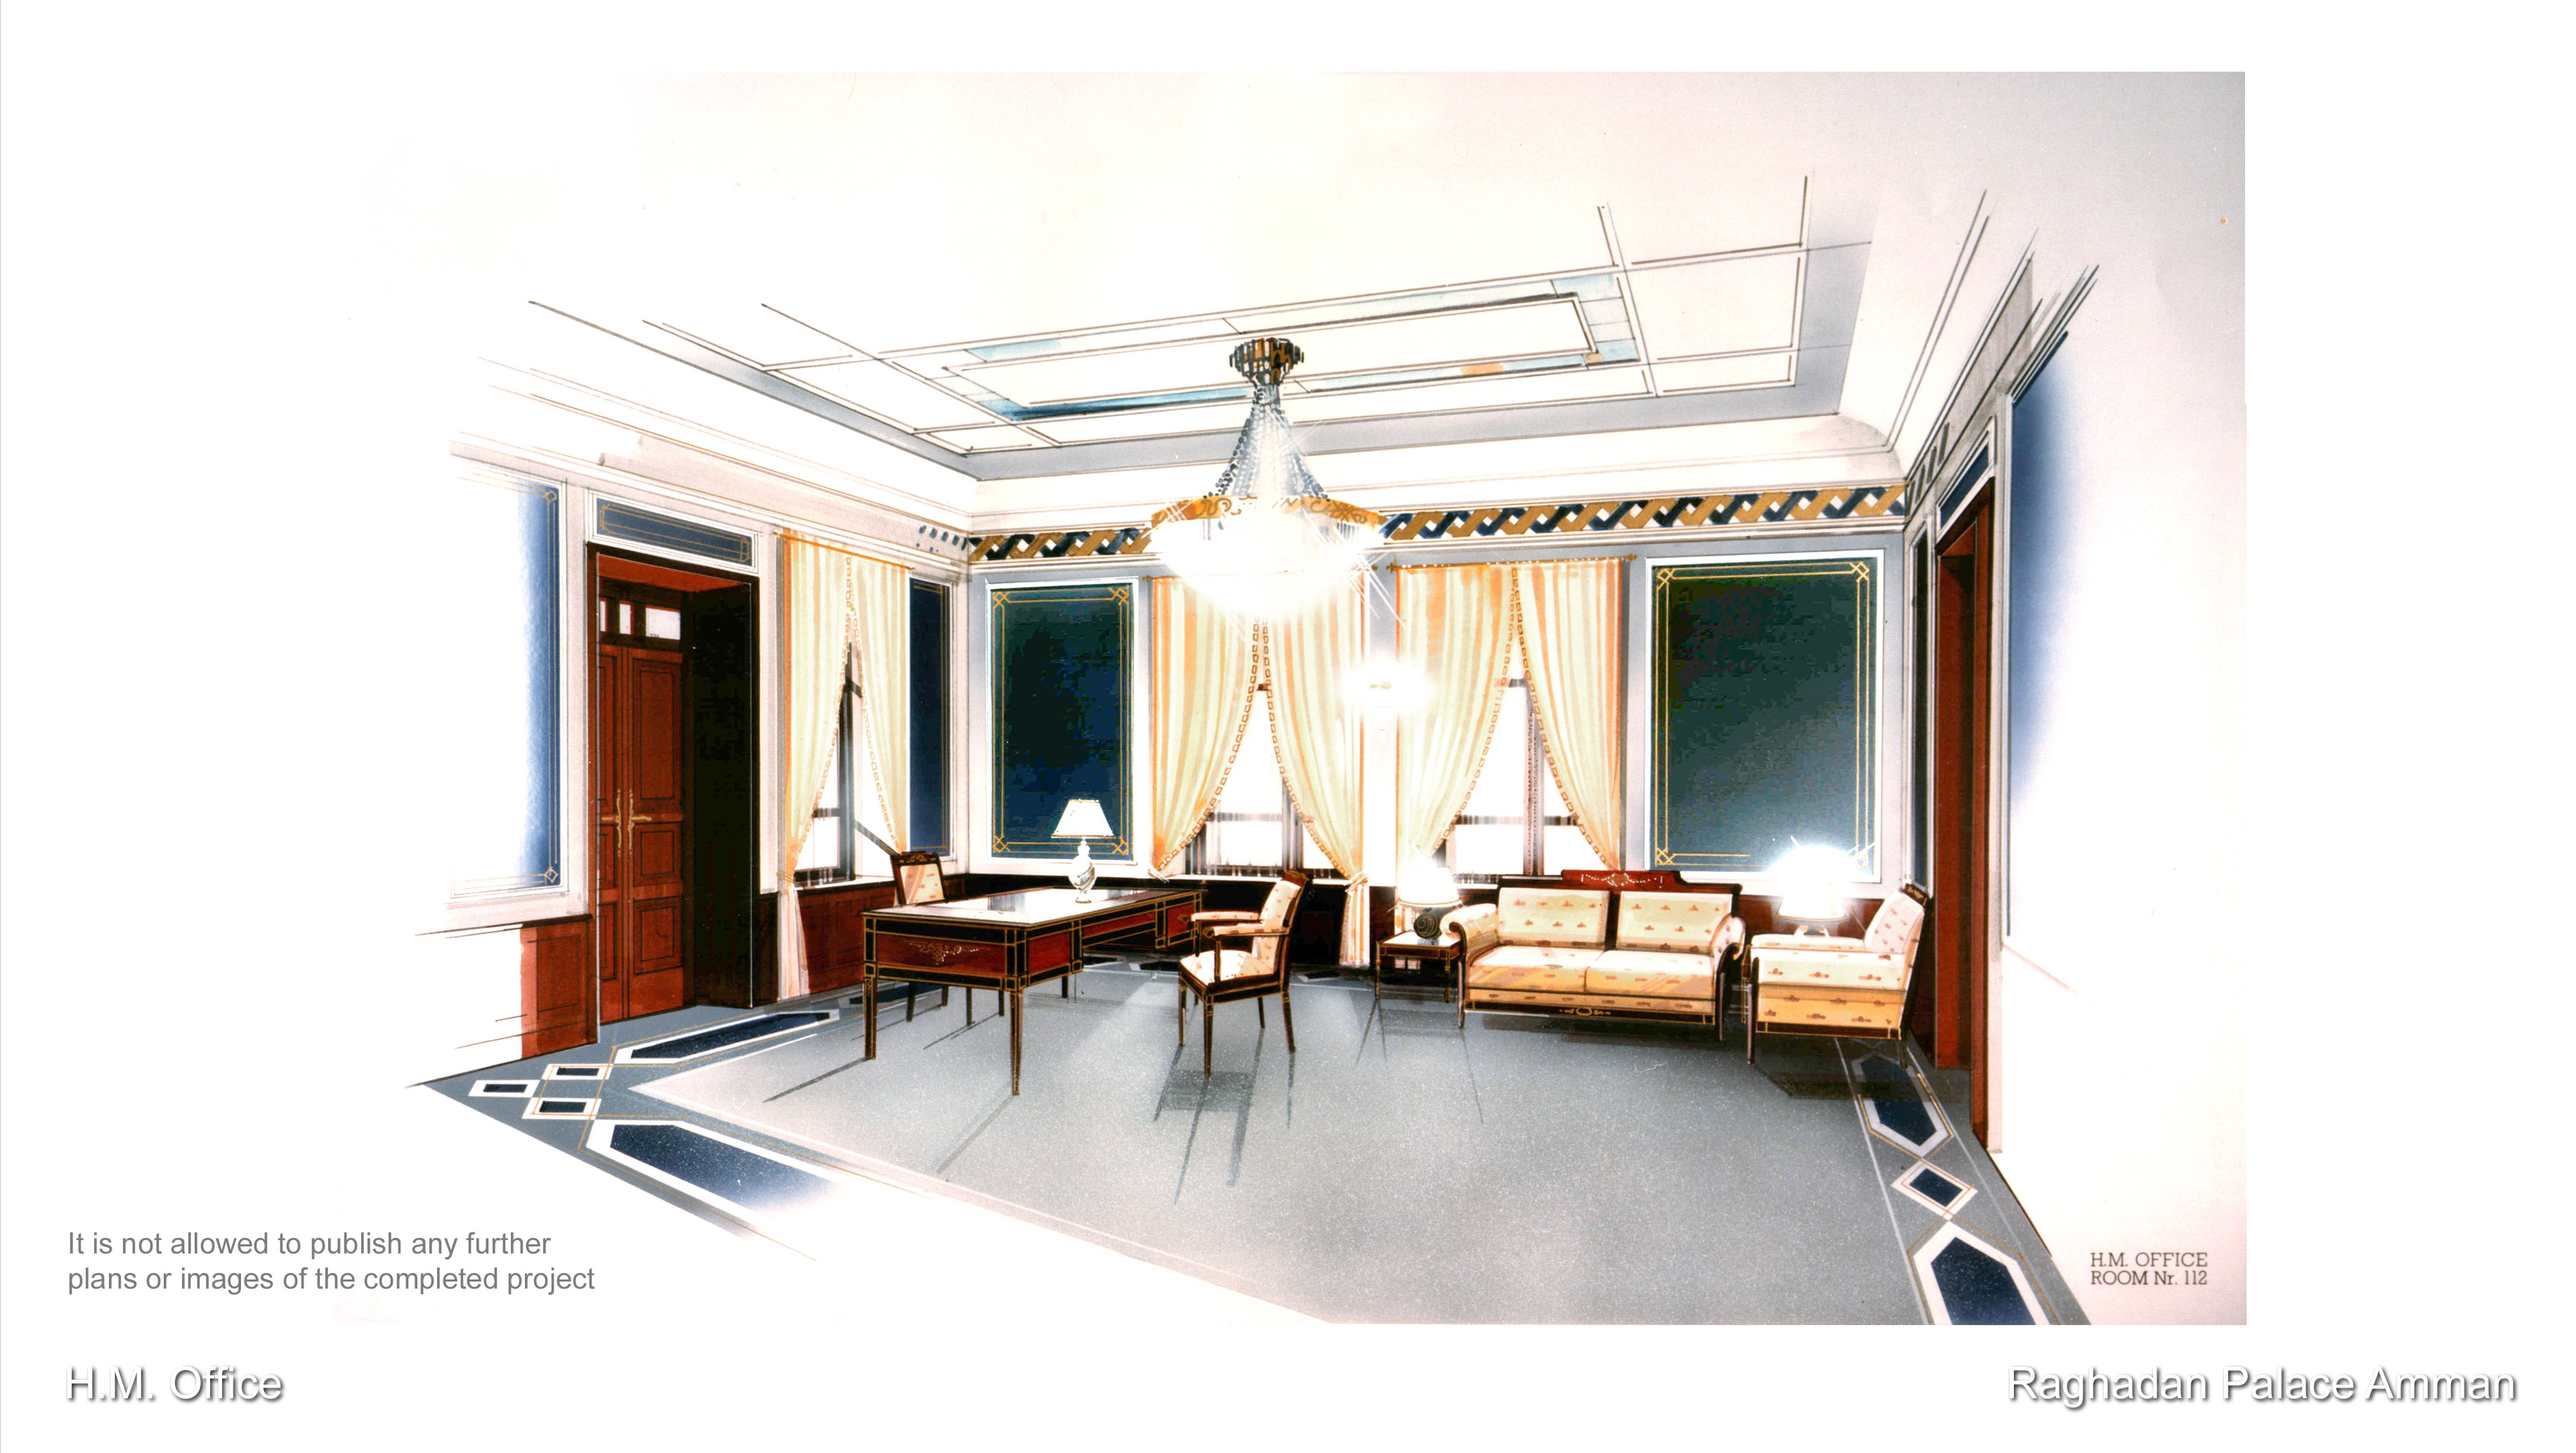 09_RP Amman H.M. Office